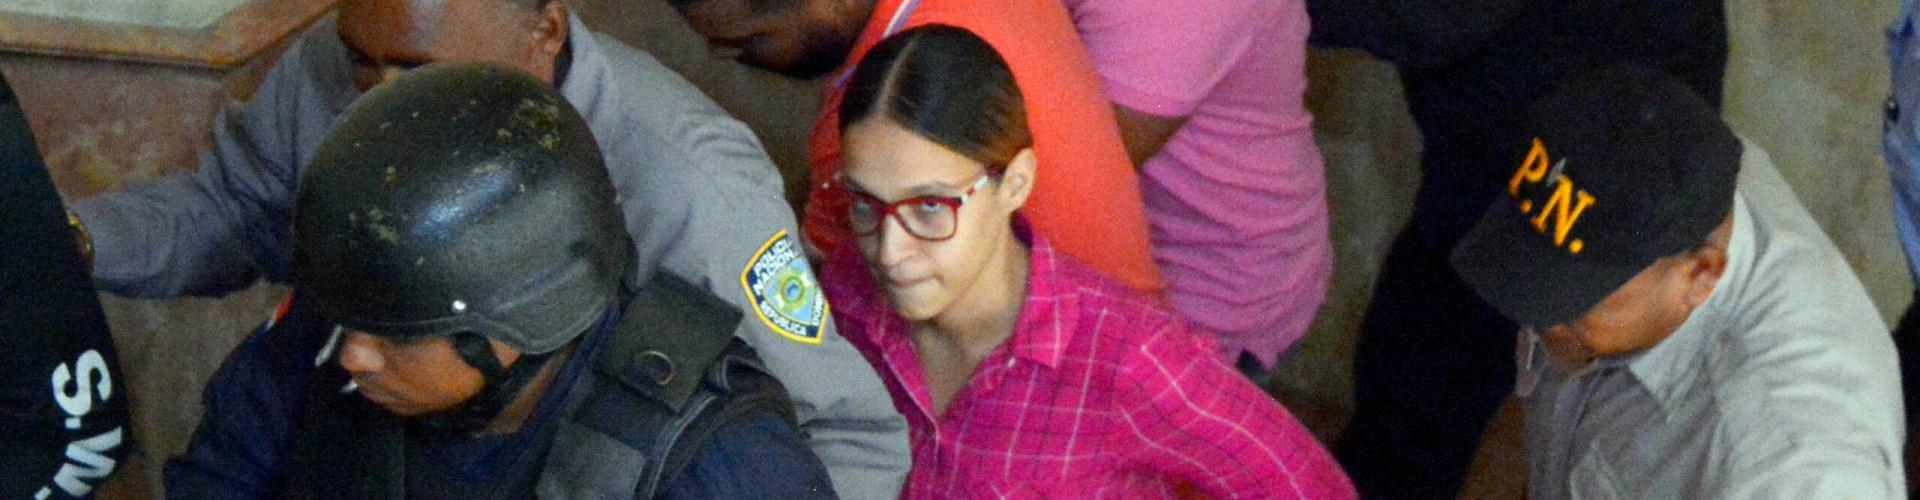 Prisión preventiva mujer agredió periodista